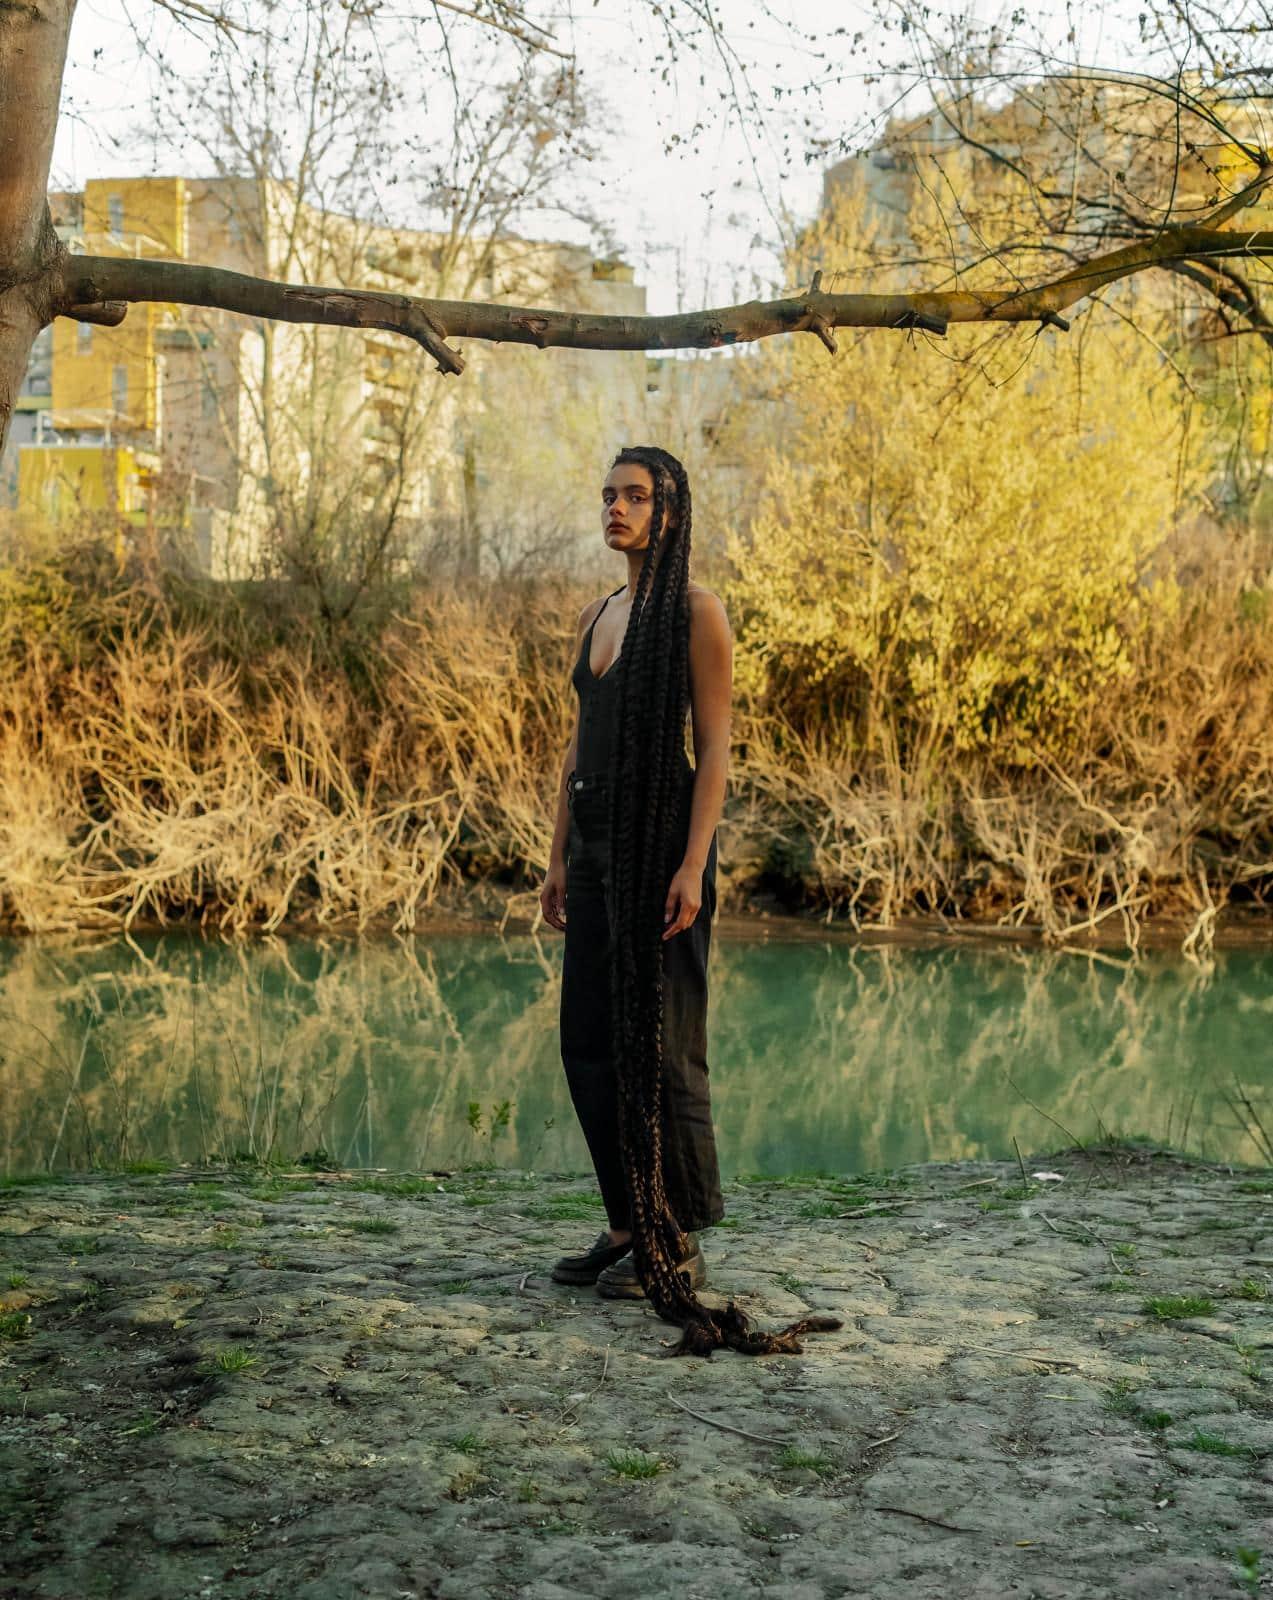 Sudnly-mag-Les Rencontres d'Arles 2021-Anyssia Bidout, Vert, 2020